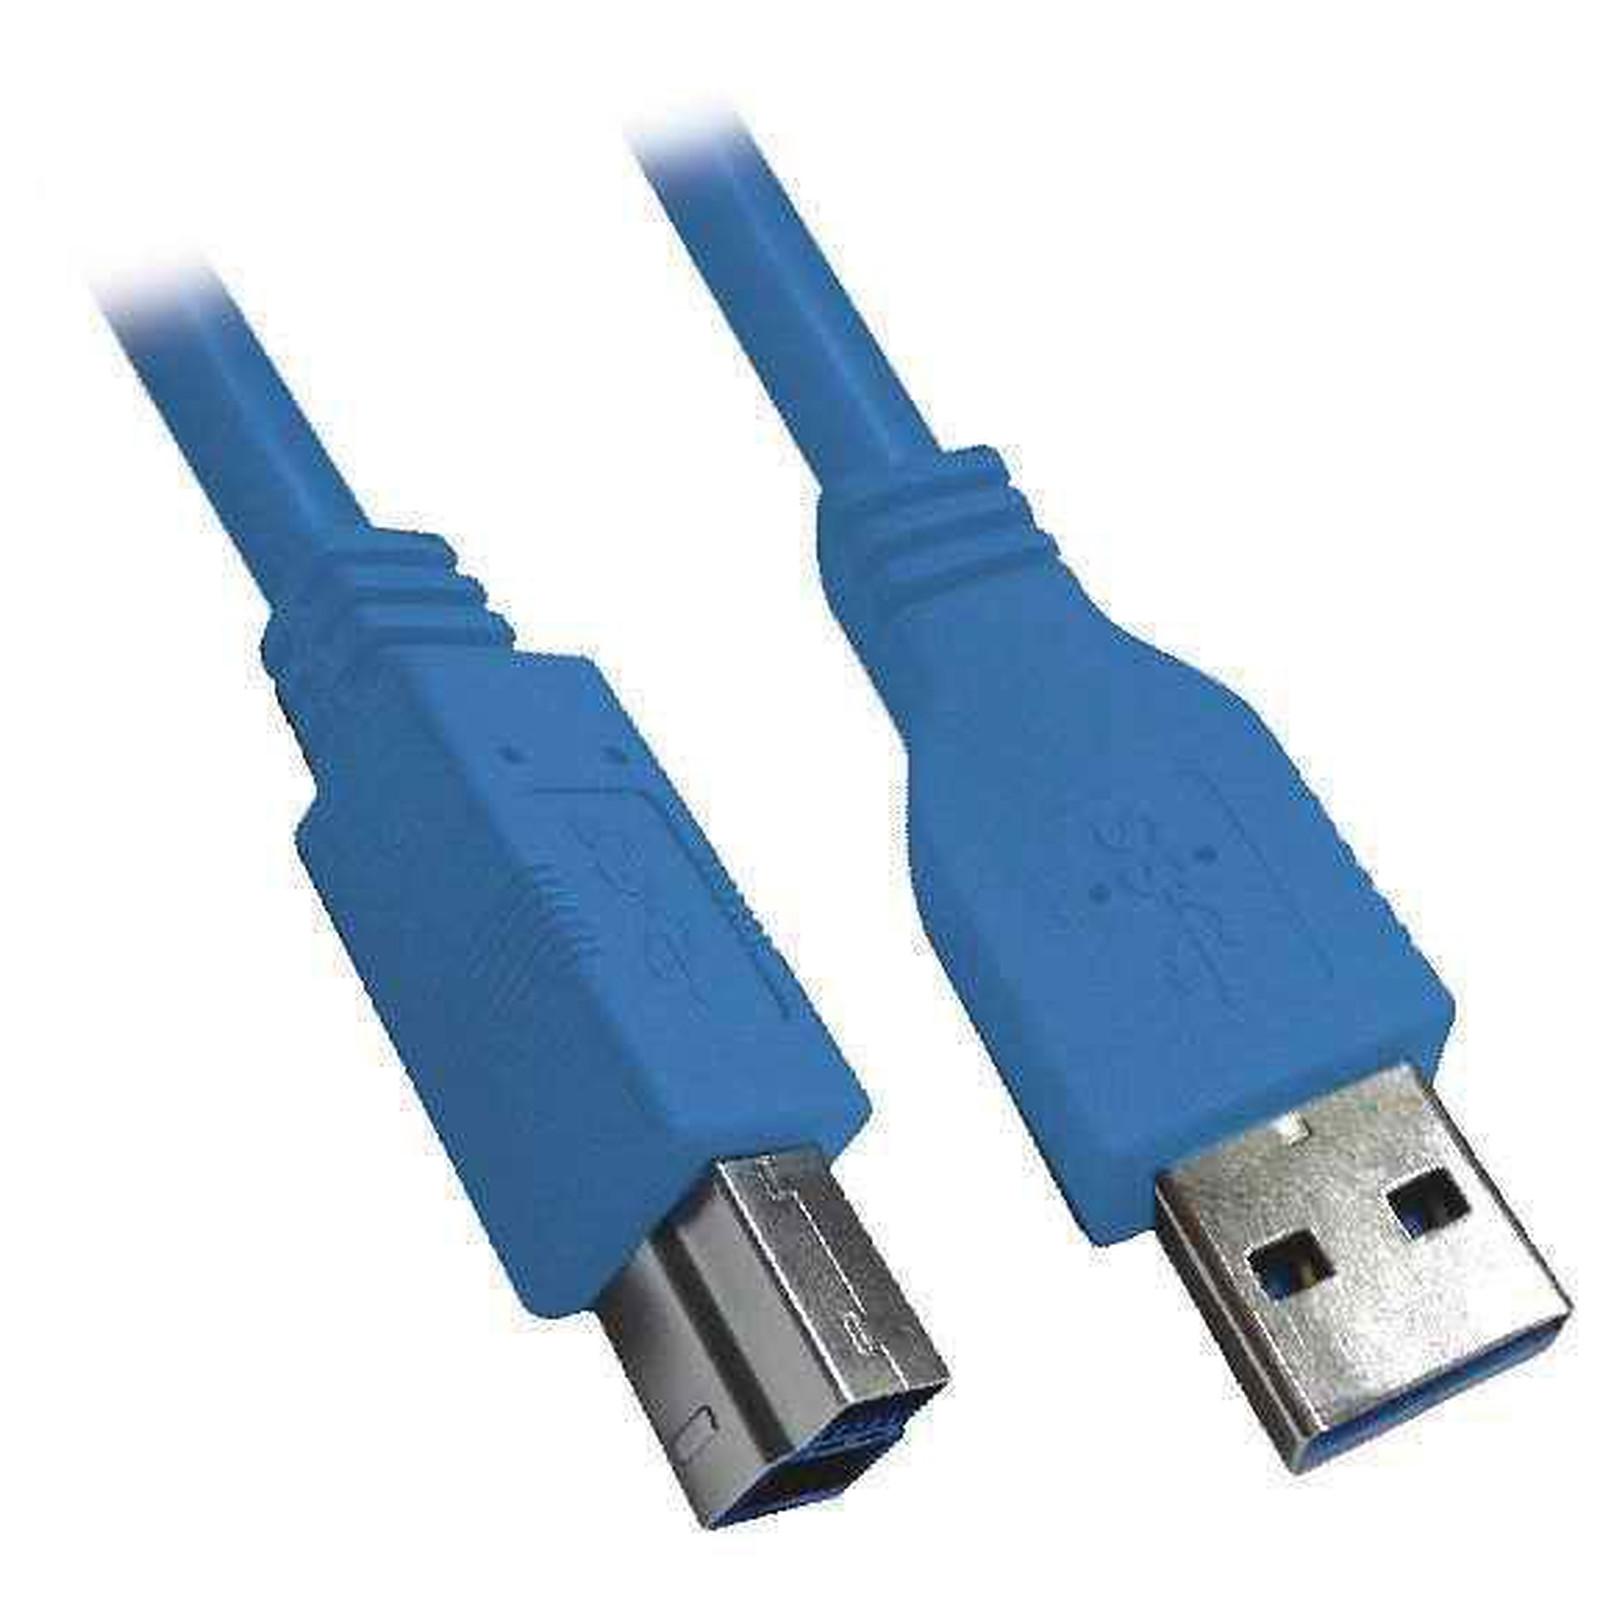 Câble USB 3.0 Type AB (Mâle/Mâle) - 1 m